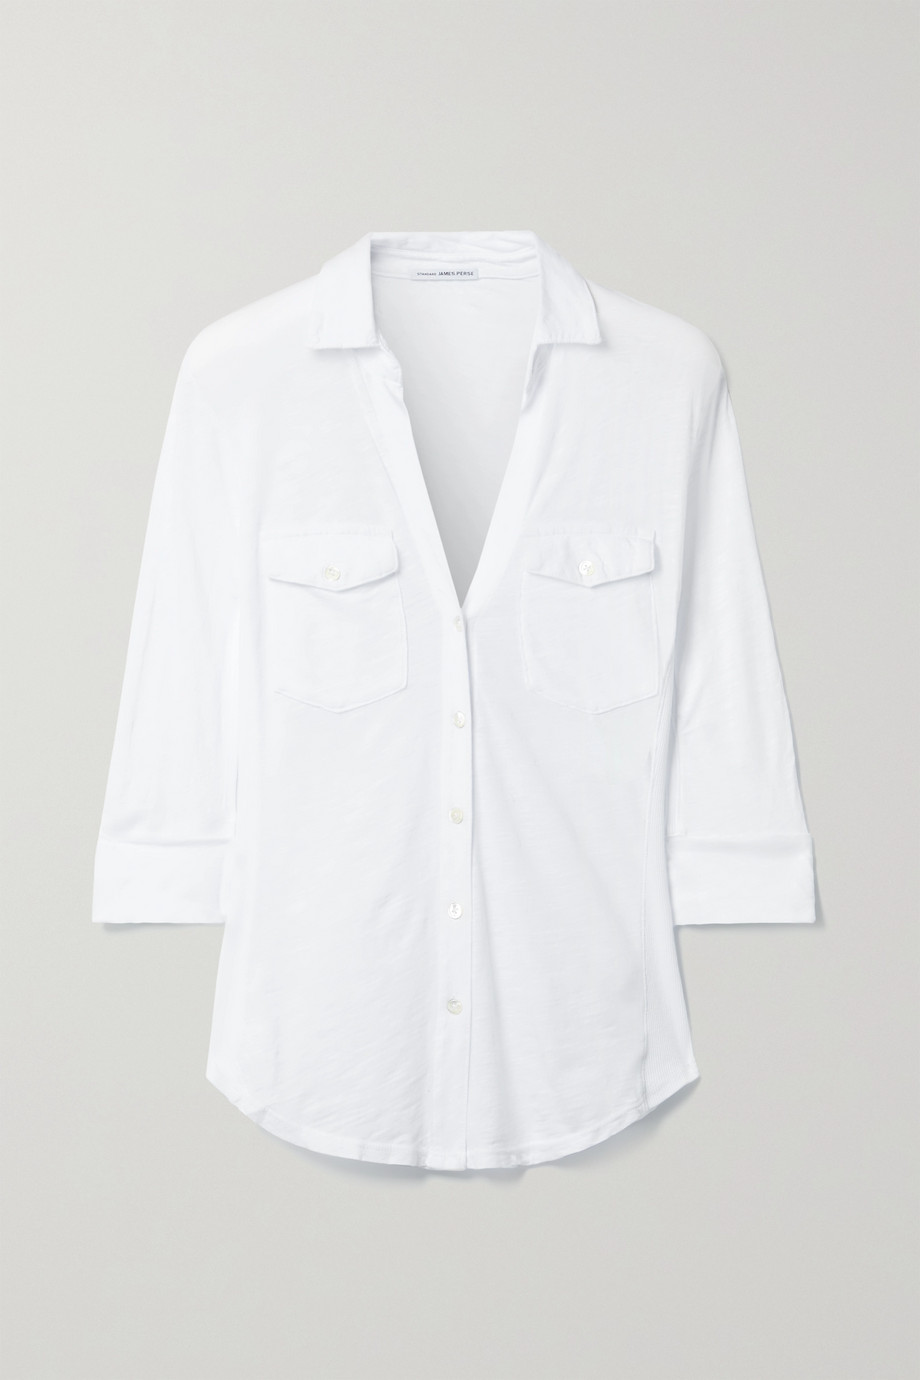 James Perse Slub Supima cotton shirt